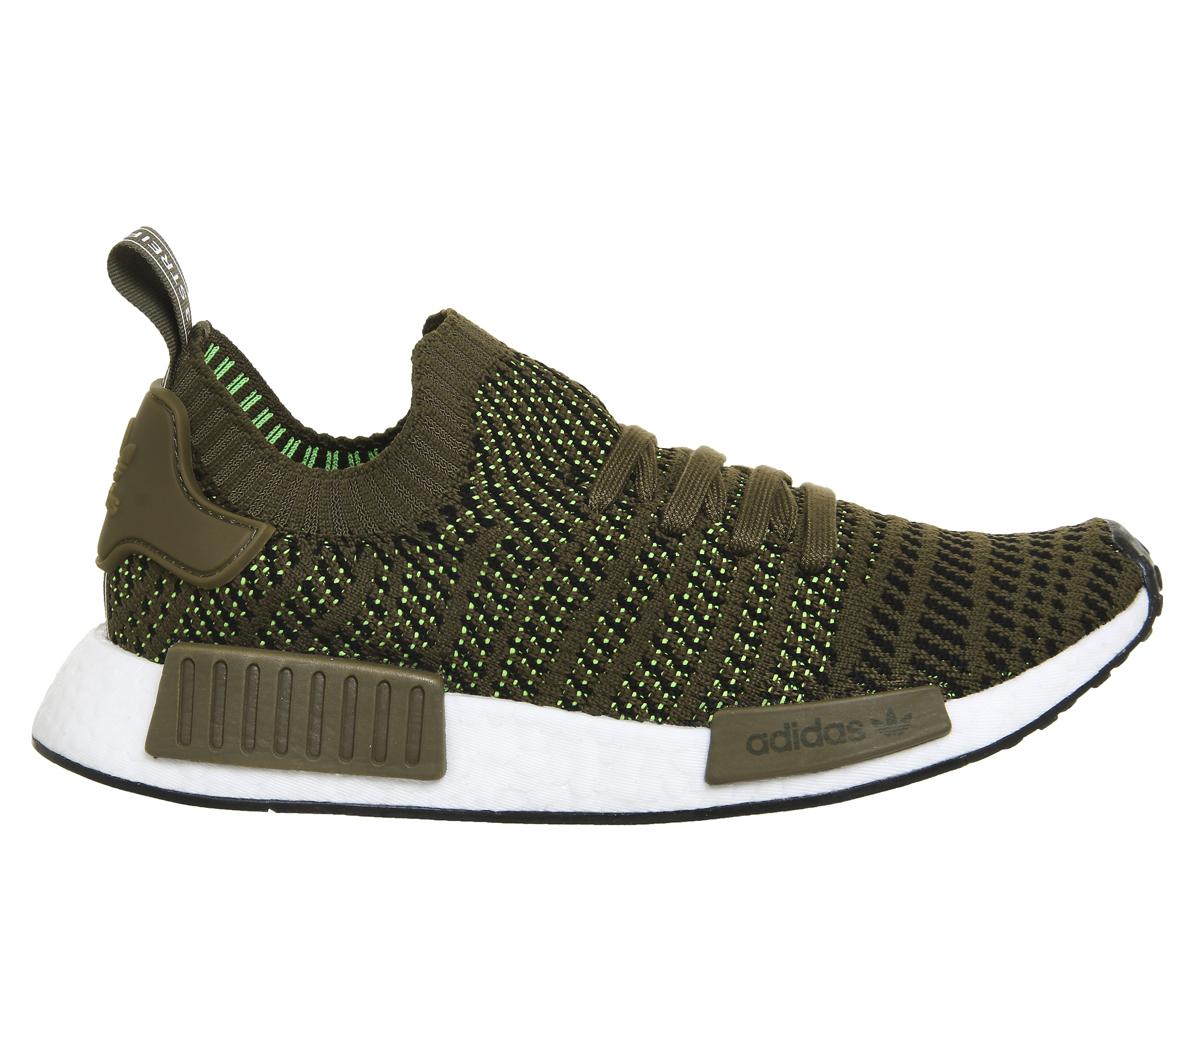 adidas nmd verde militare